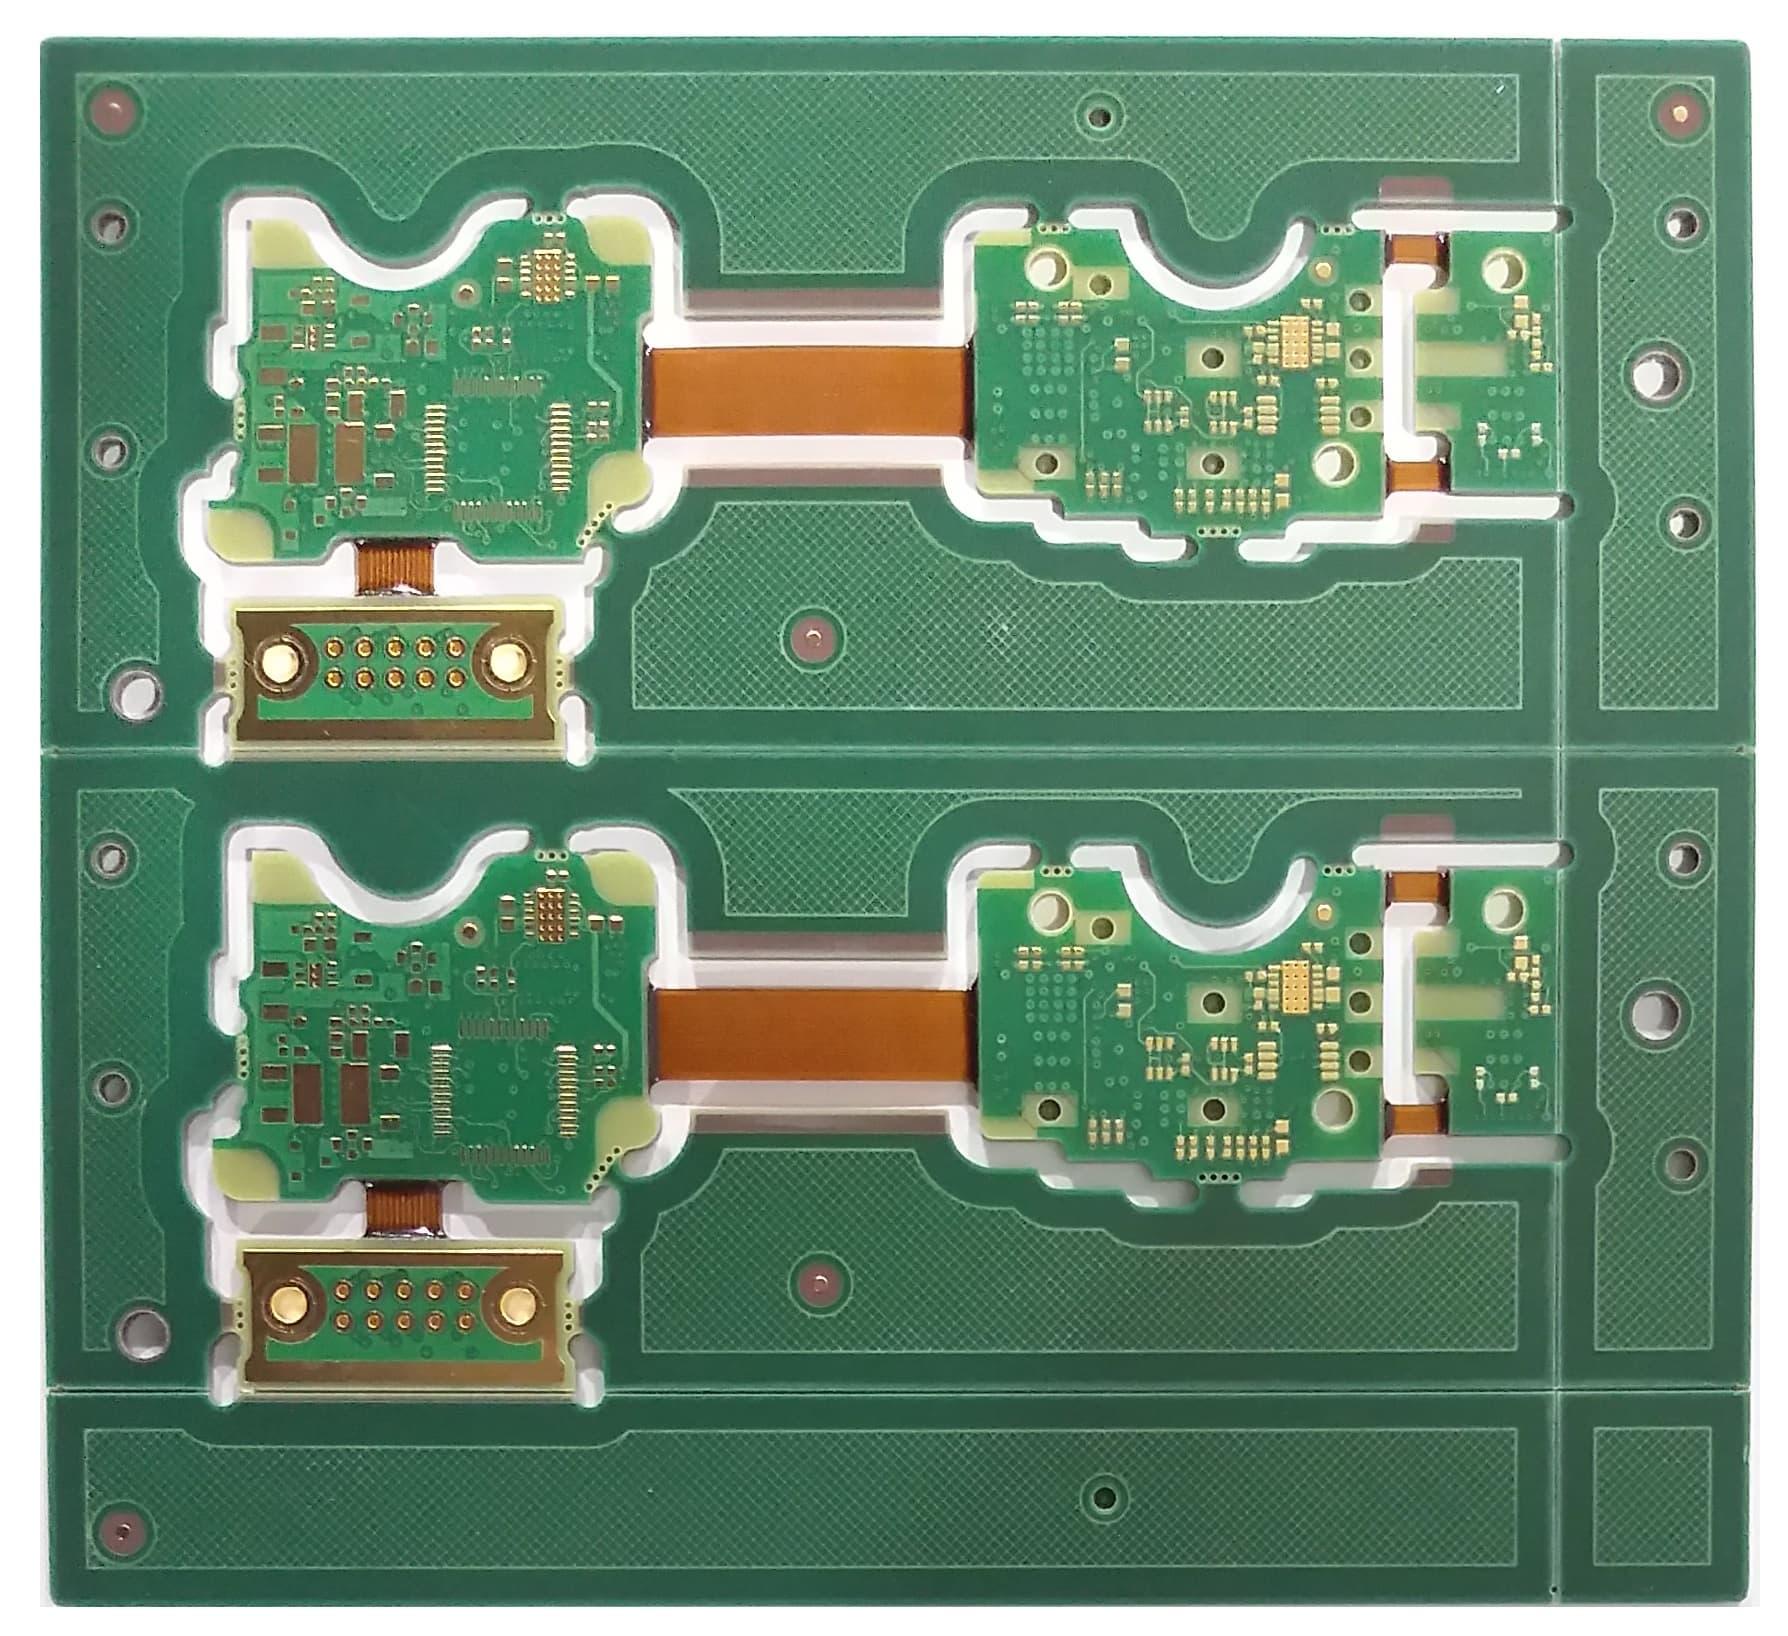 Electrical Equipment Components Telecomspassive Componentspcb Rigidflex Circuit Boards Osp Lead Free Pcb Printed Board Rigid Flex Rf For Car Electronic System